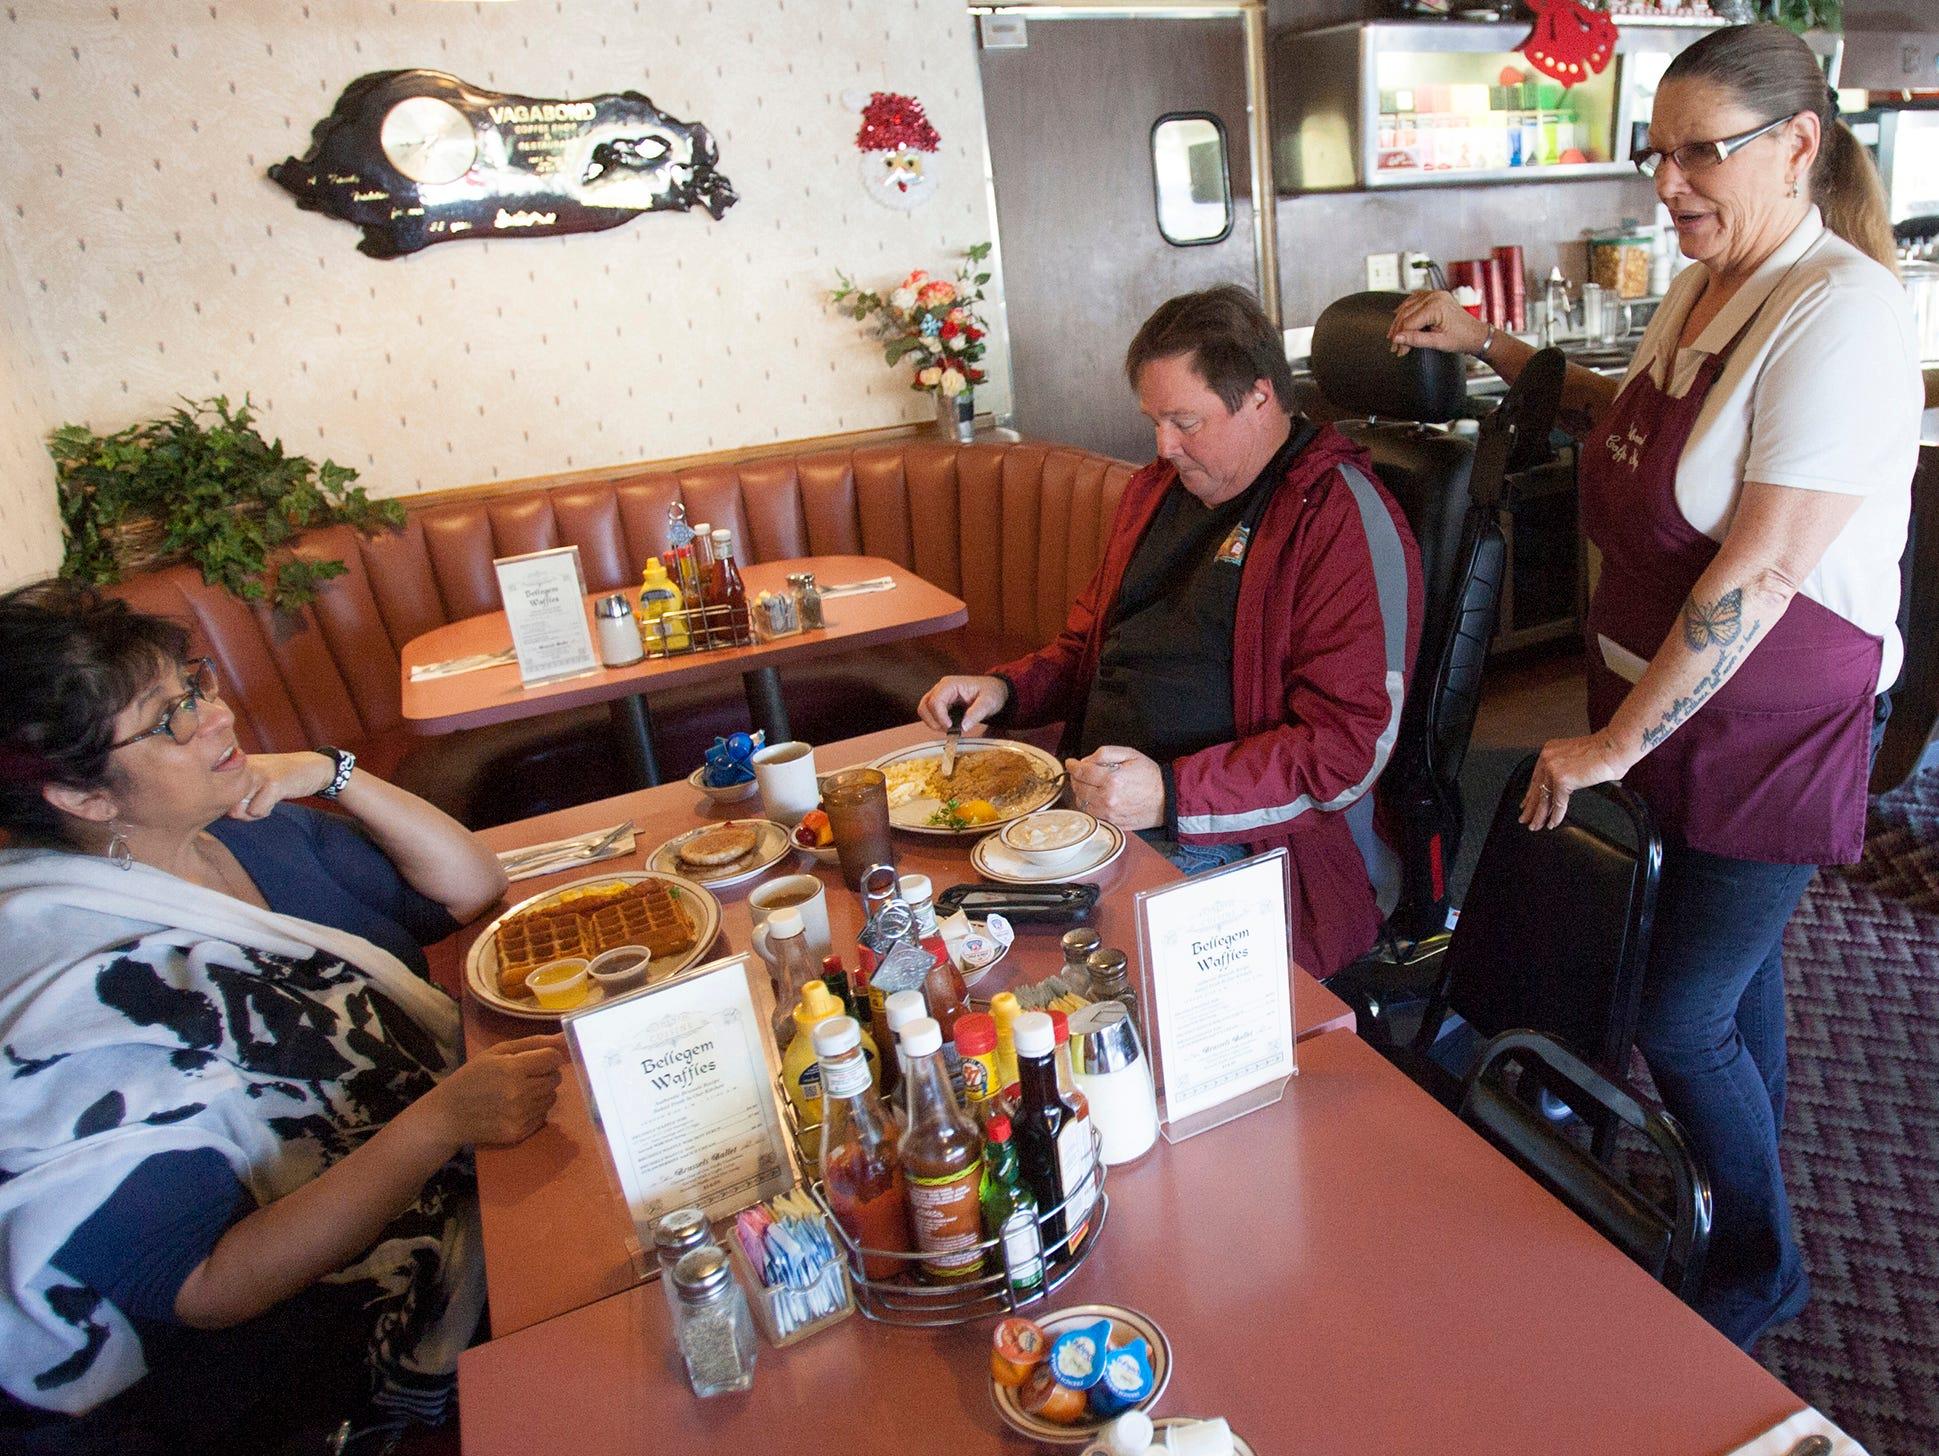 Vagabond Restaurant, a 50-plus year institution in Ventura, to close its doors Jan. 1